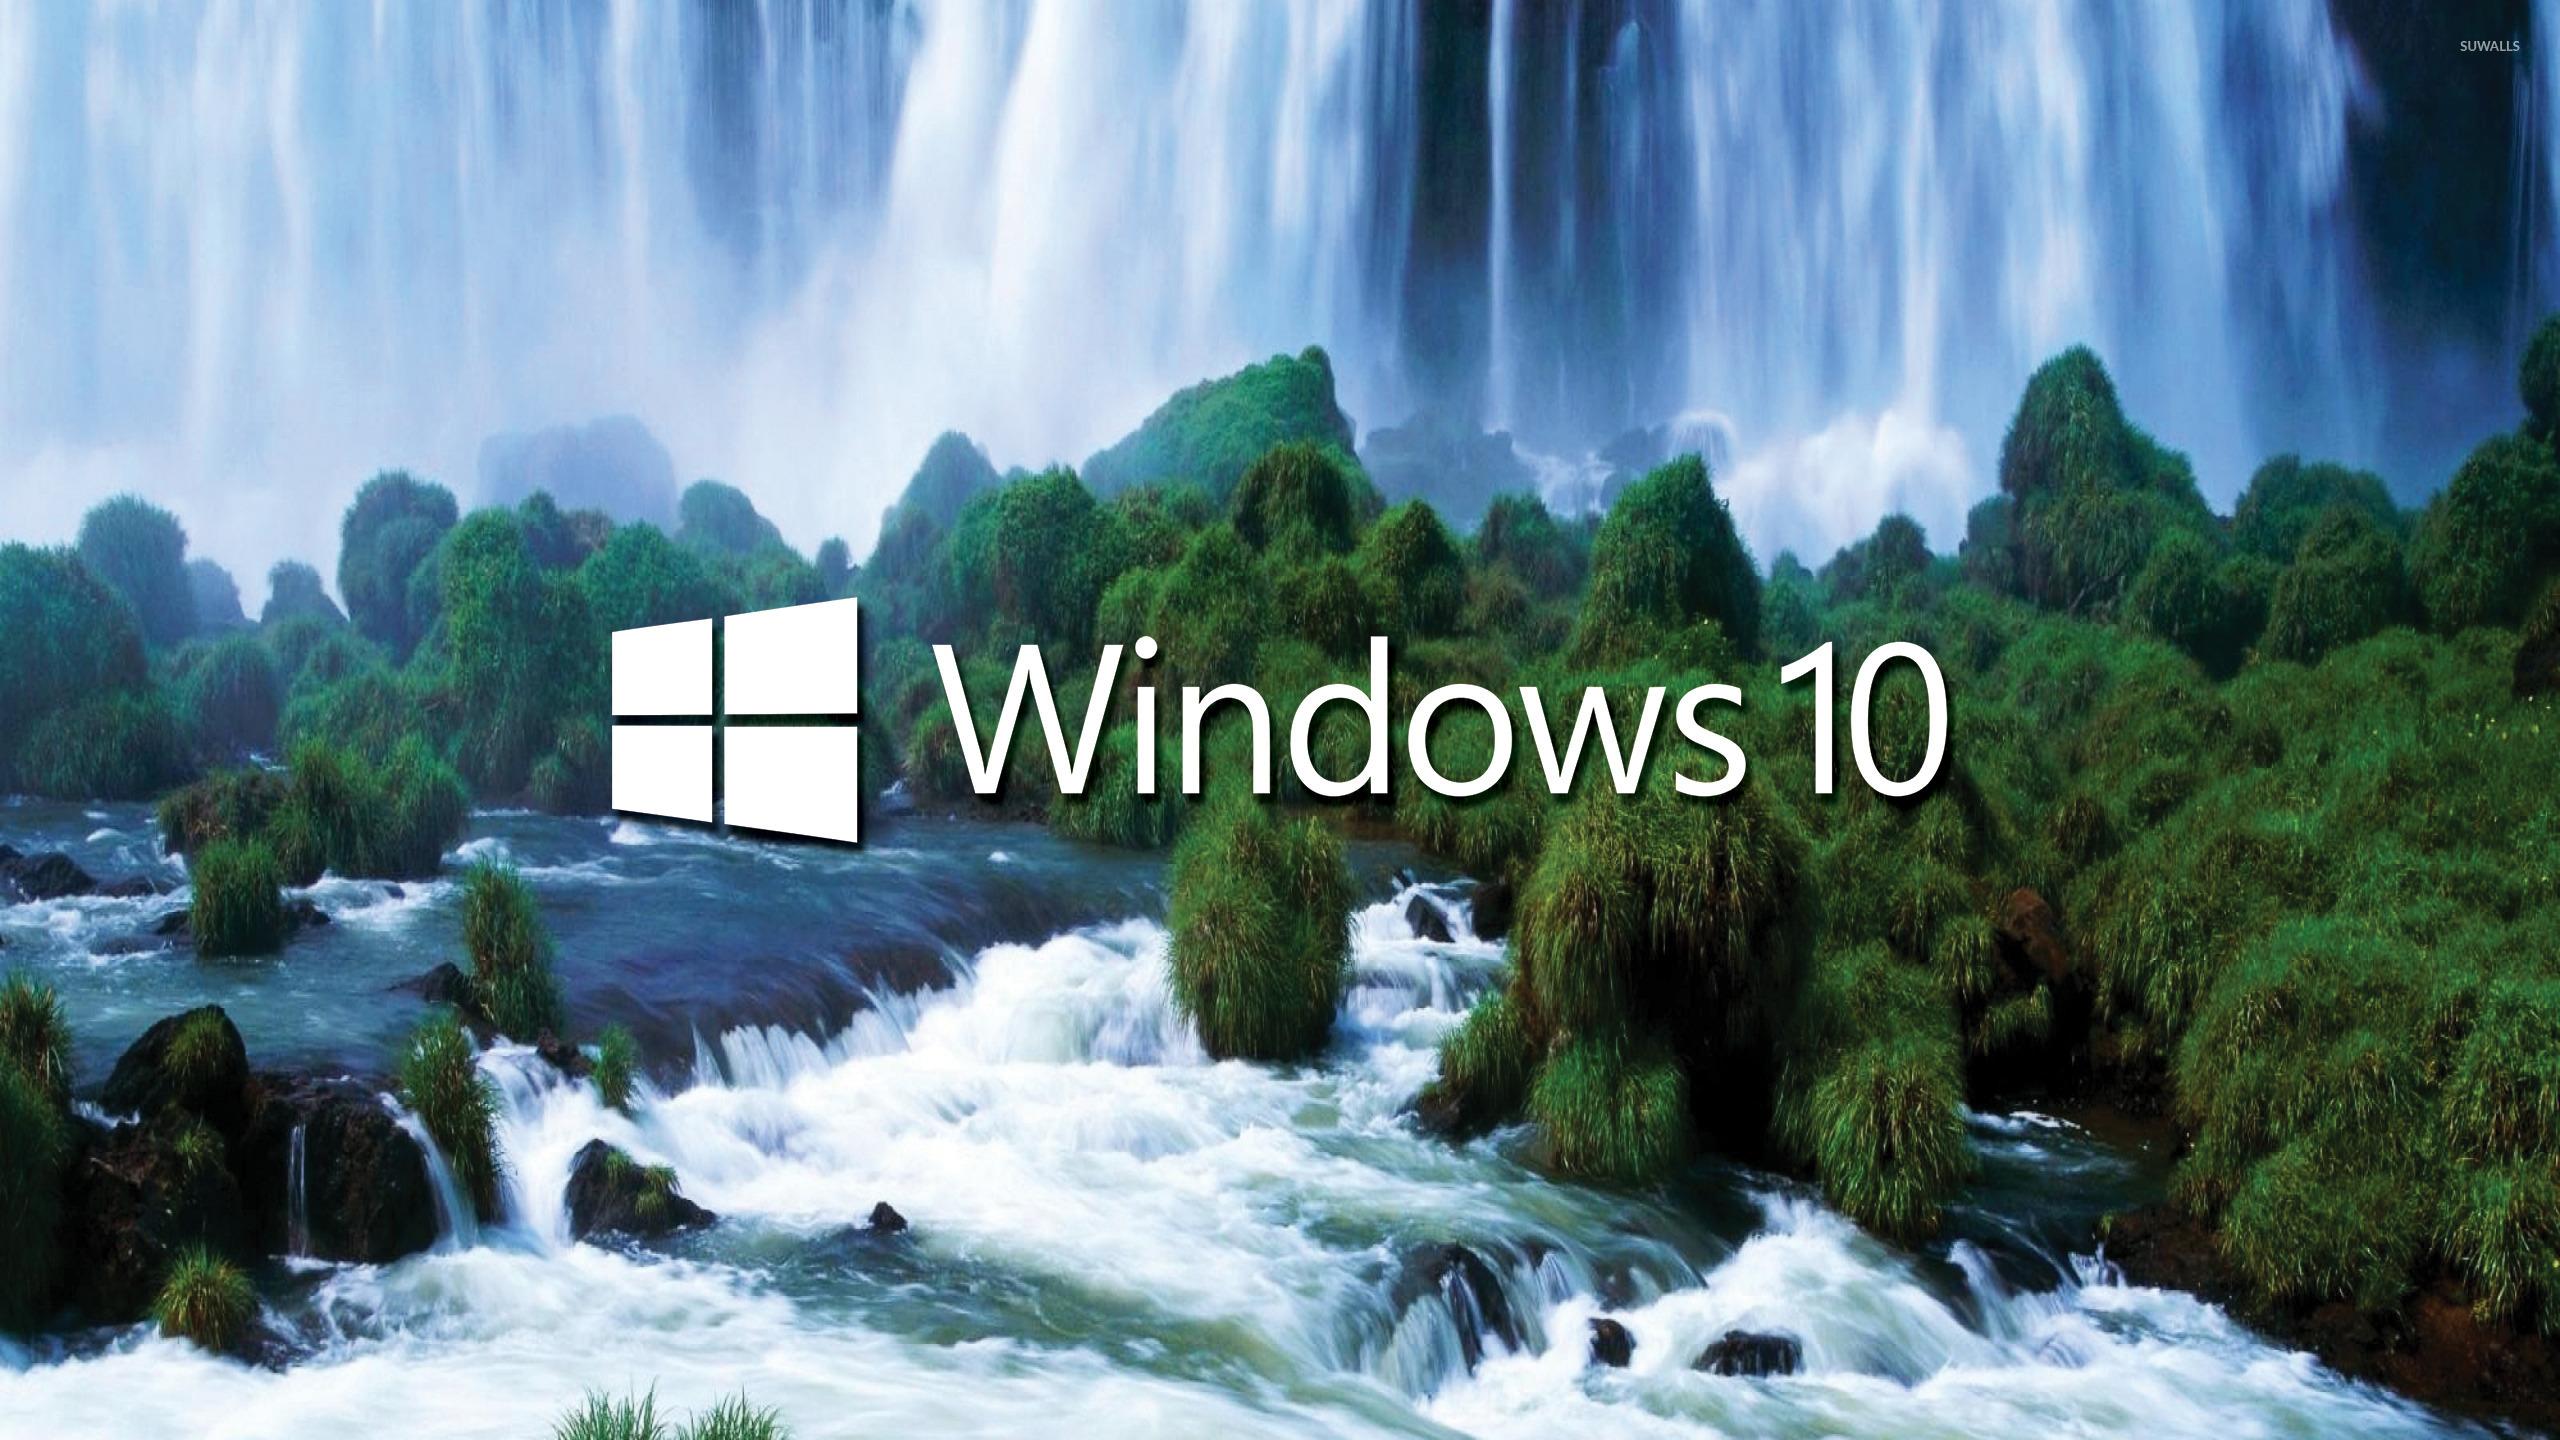 Iguazu Falls Wallpaper 1920x1200 Windows 10 White Text Logo By The Waterfall Wallpaper